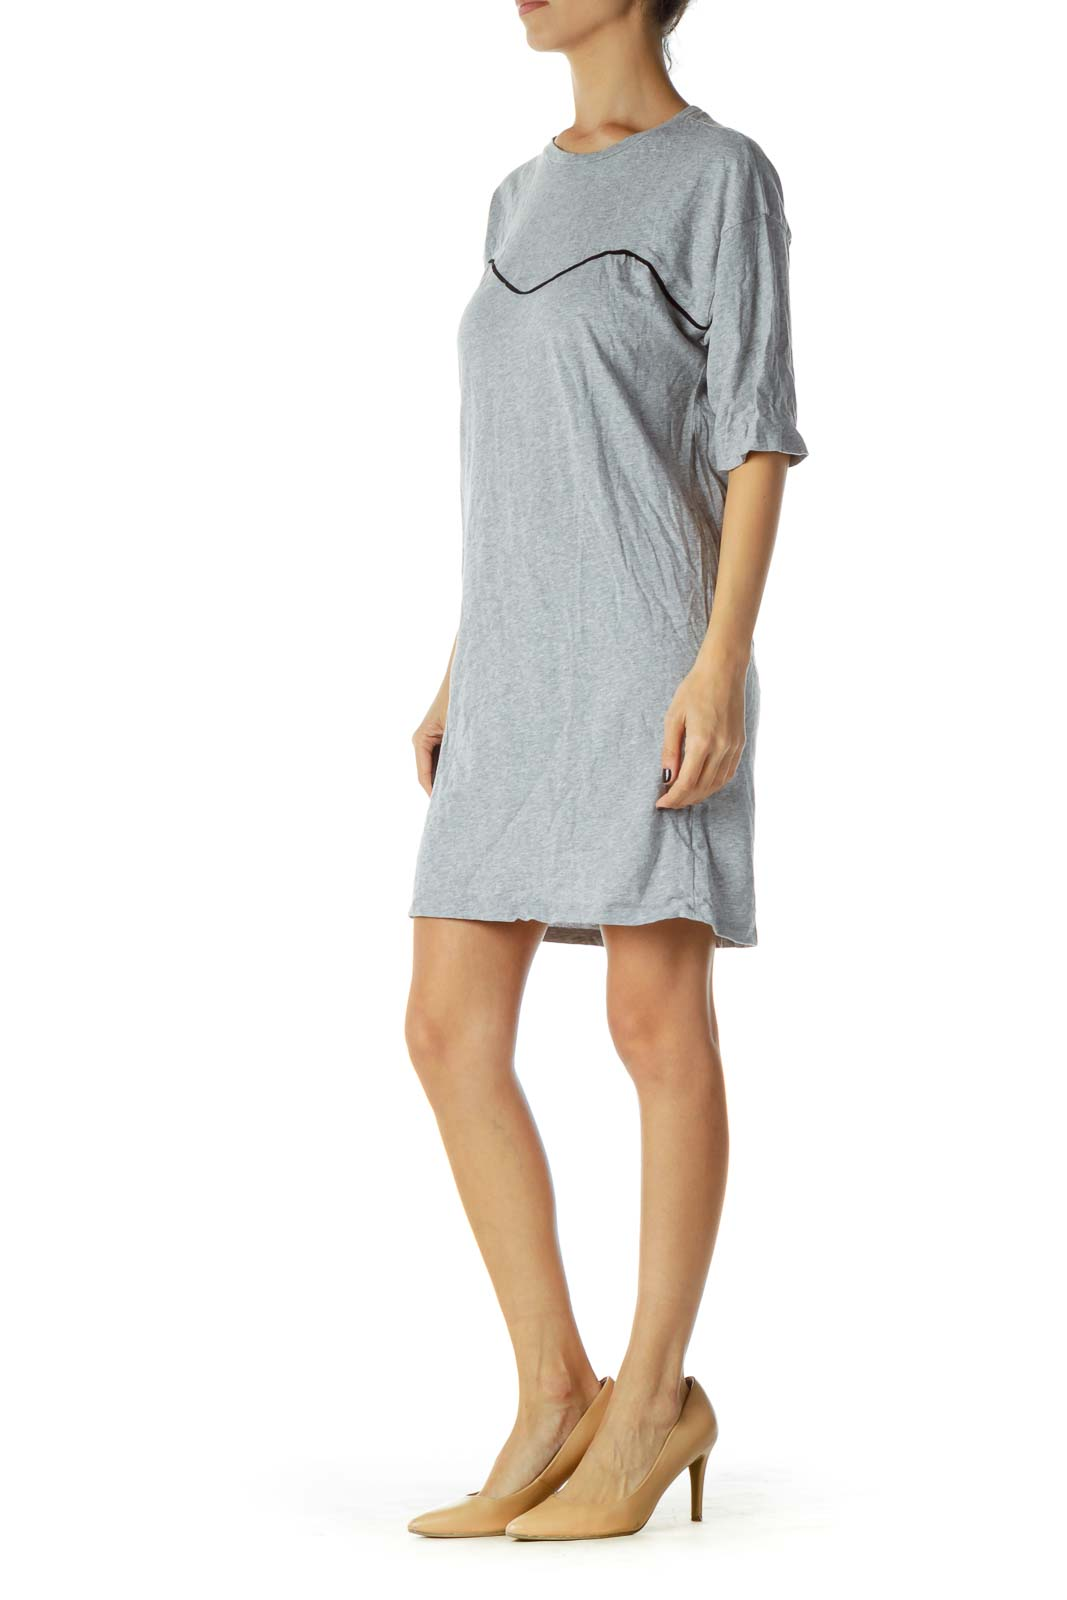 Gray Jersey-Knit Dress